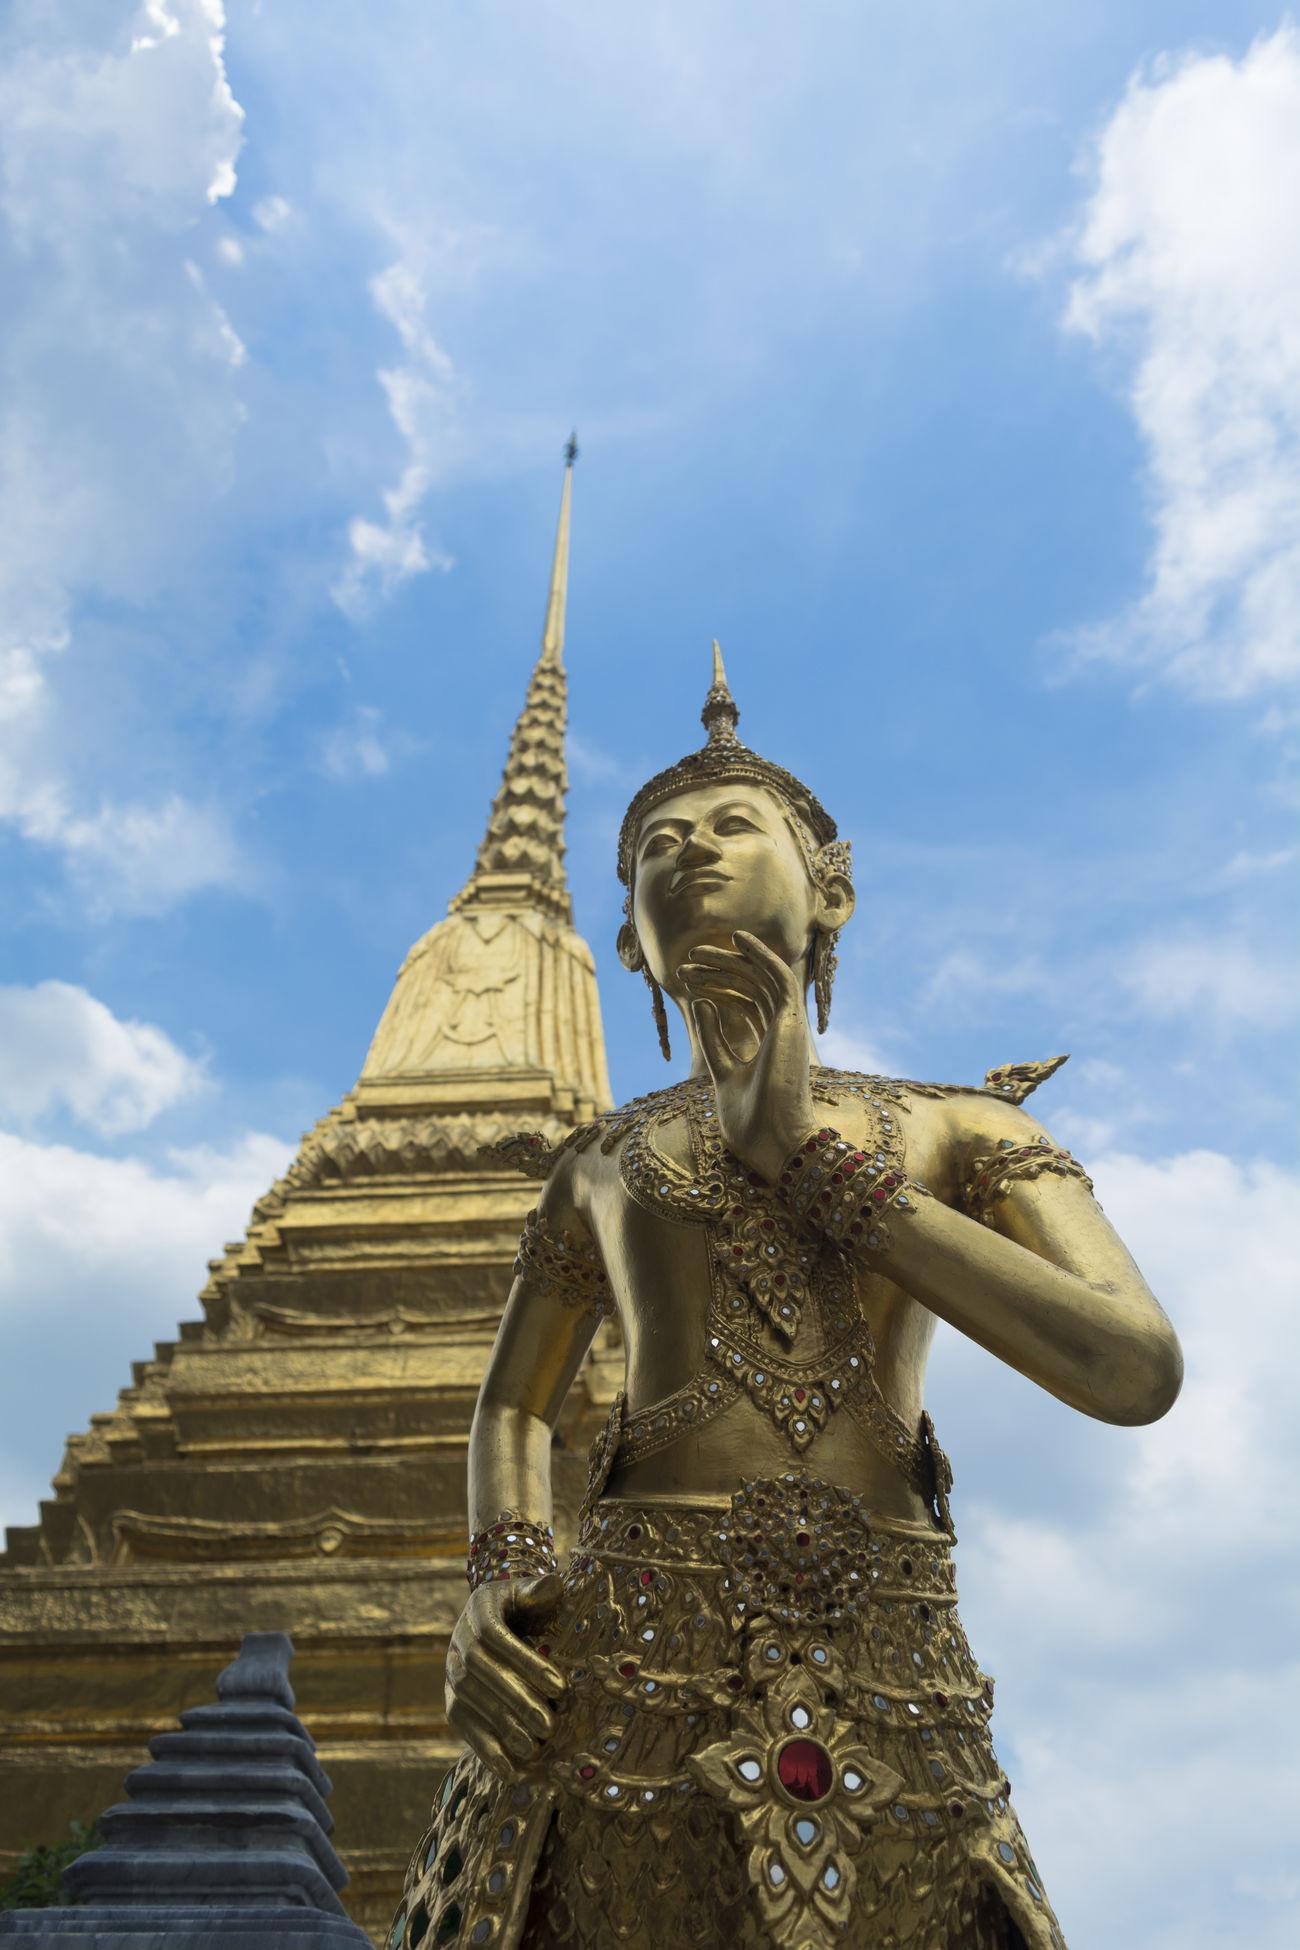 Thailand Bangkok Statue Vacations Outdoors Grand Palace Bangkok Thailand Budha Sky Landscape The Architect - 2017 EyeEm Awards